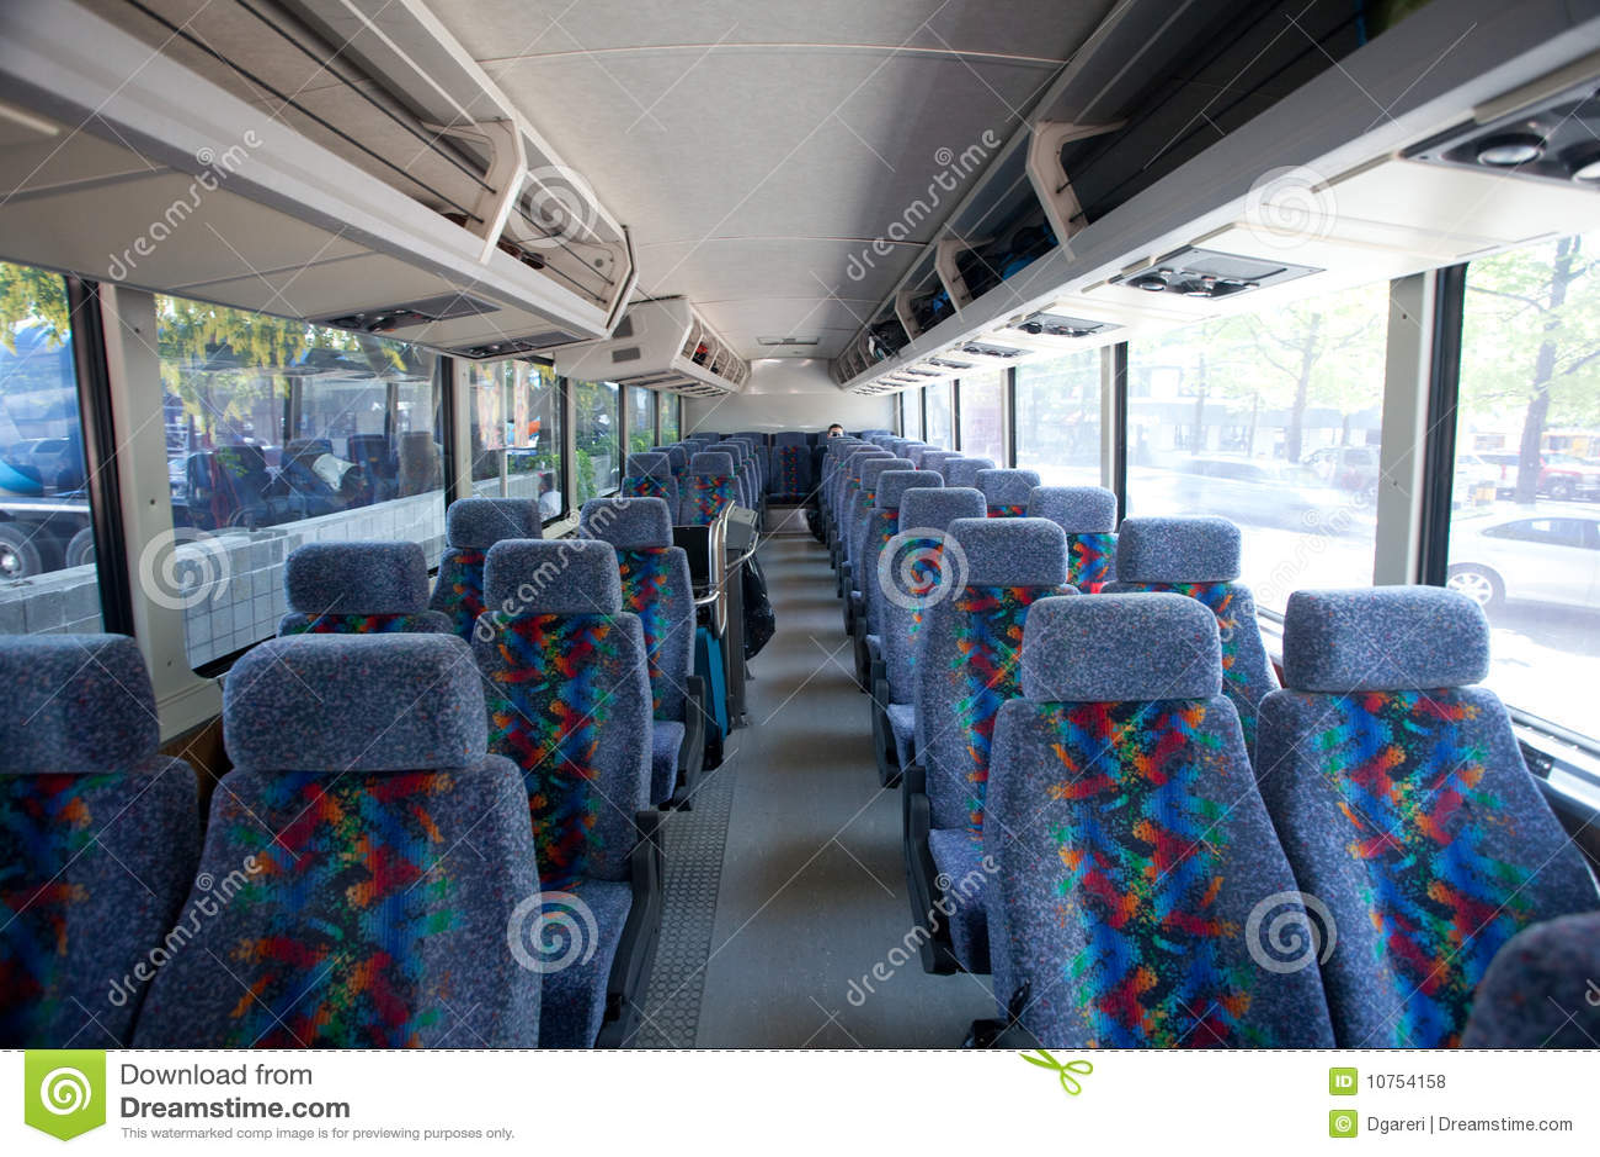 Free tour bus business plan